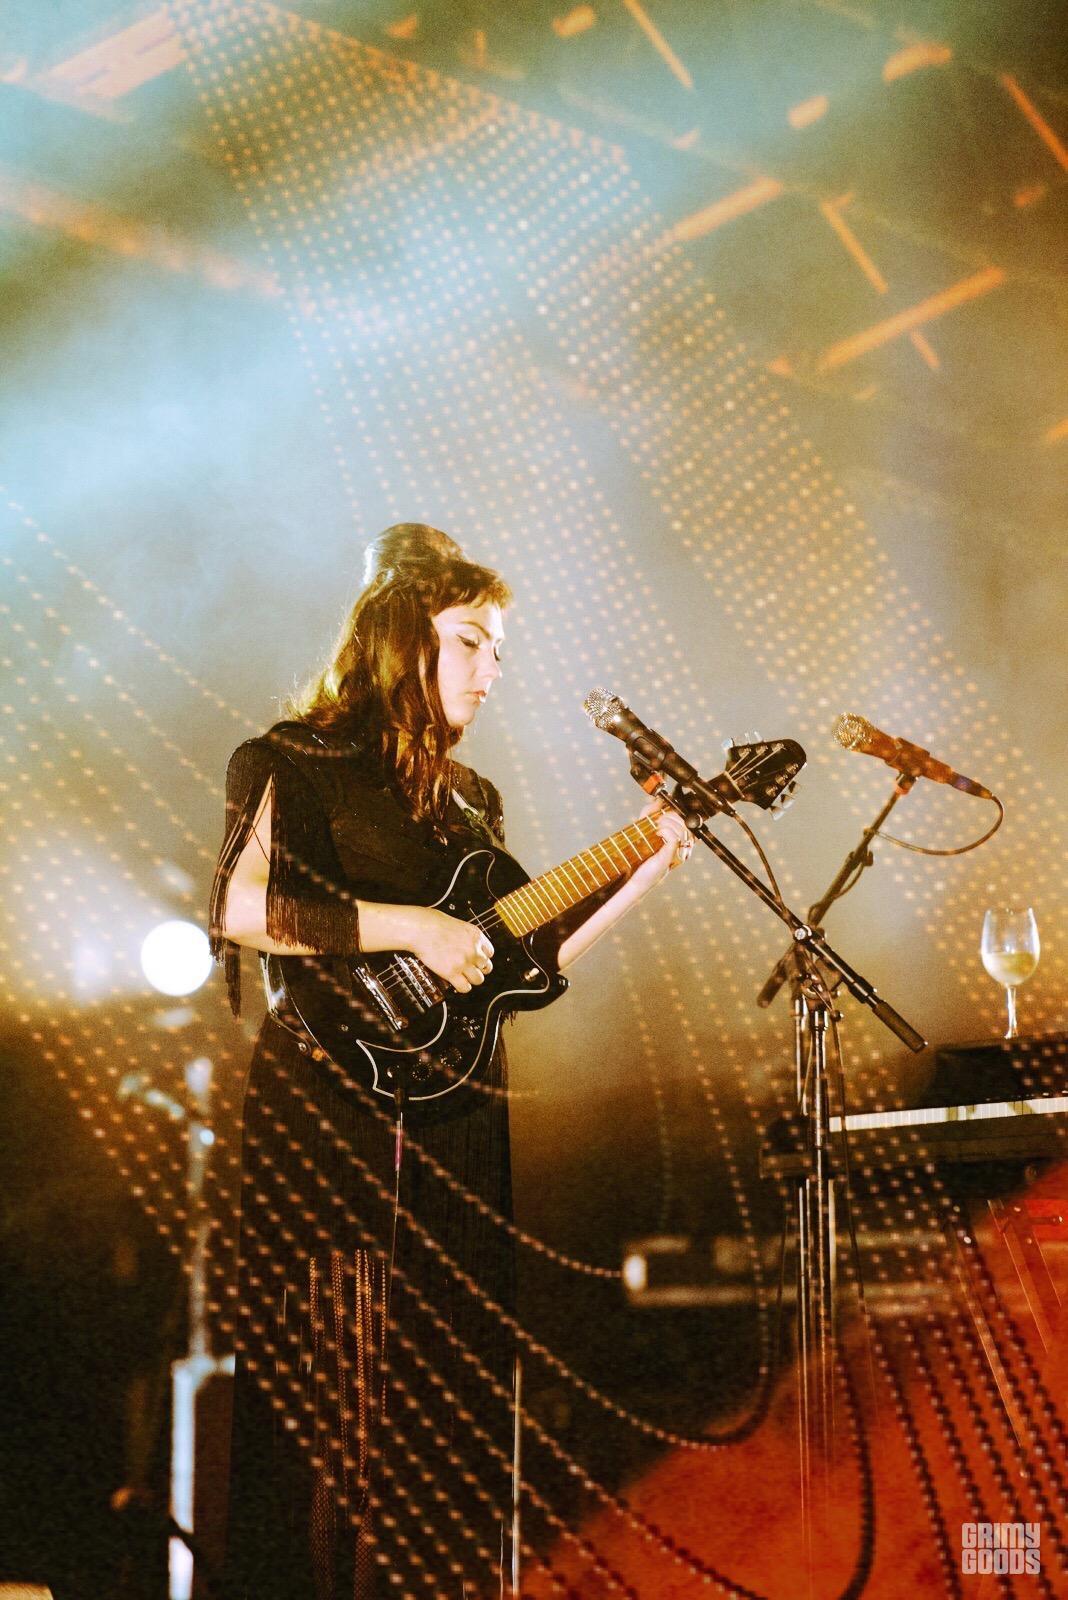 Angel Olsen at the Palace Theatre shot by Danielle Gornbein